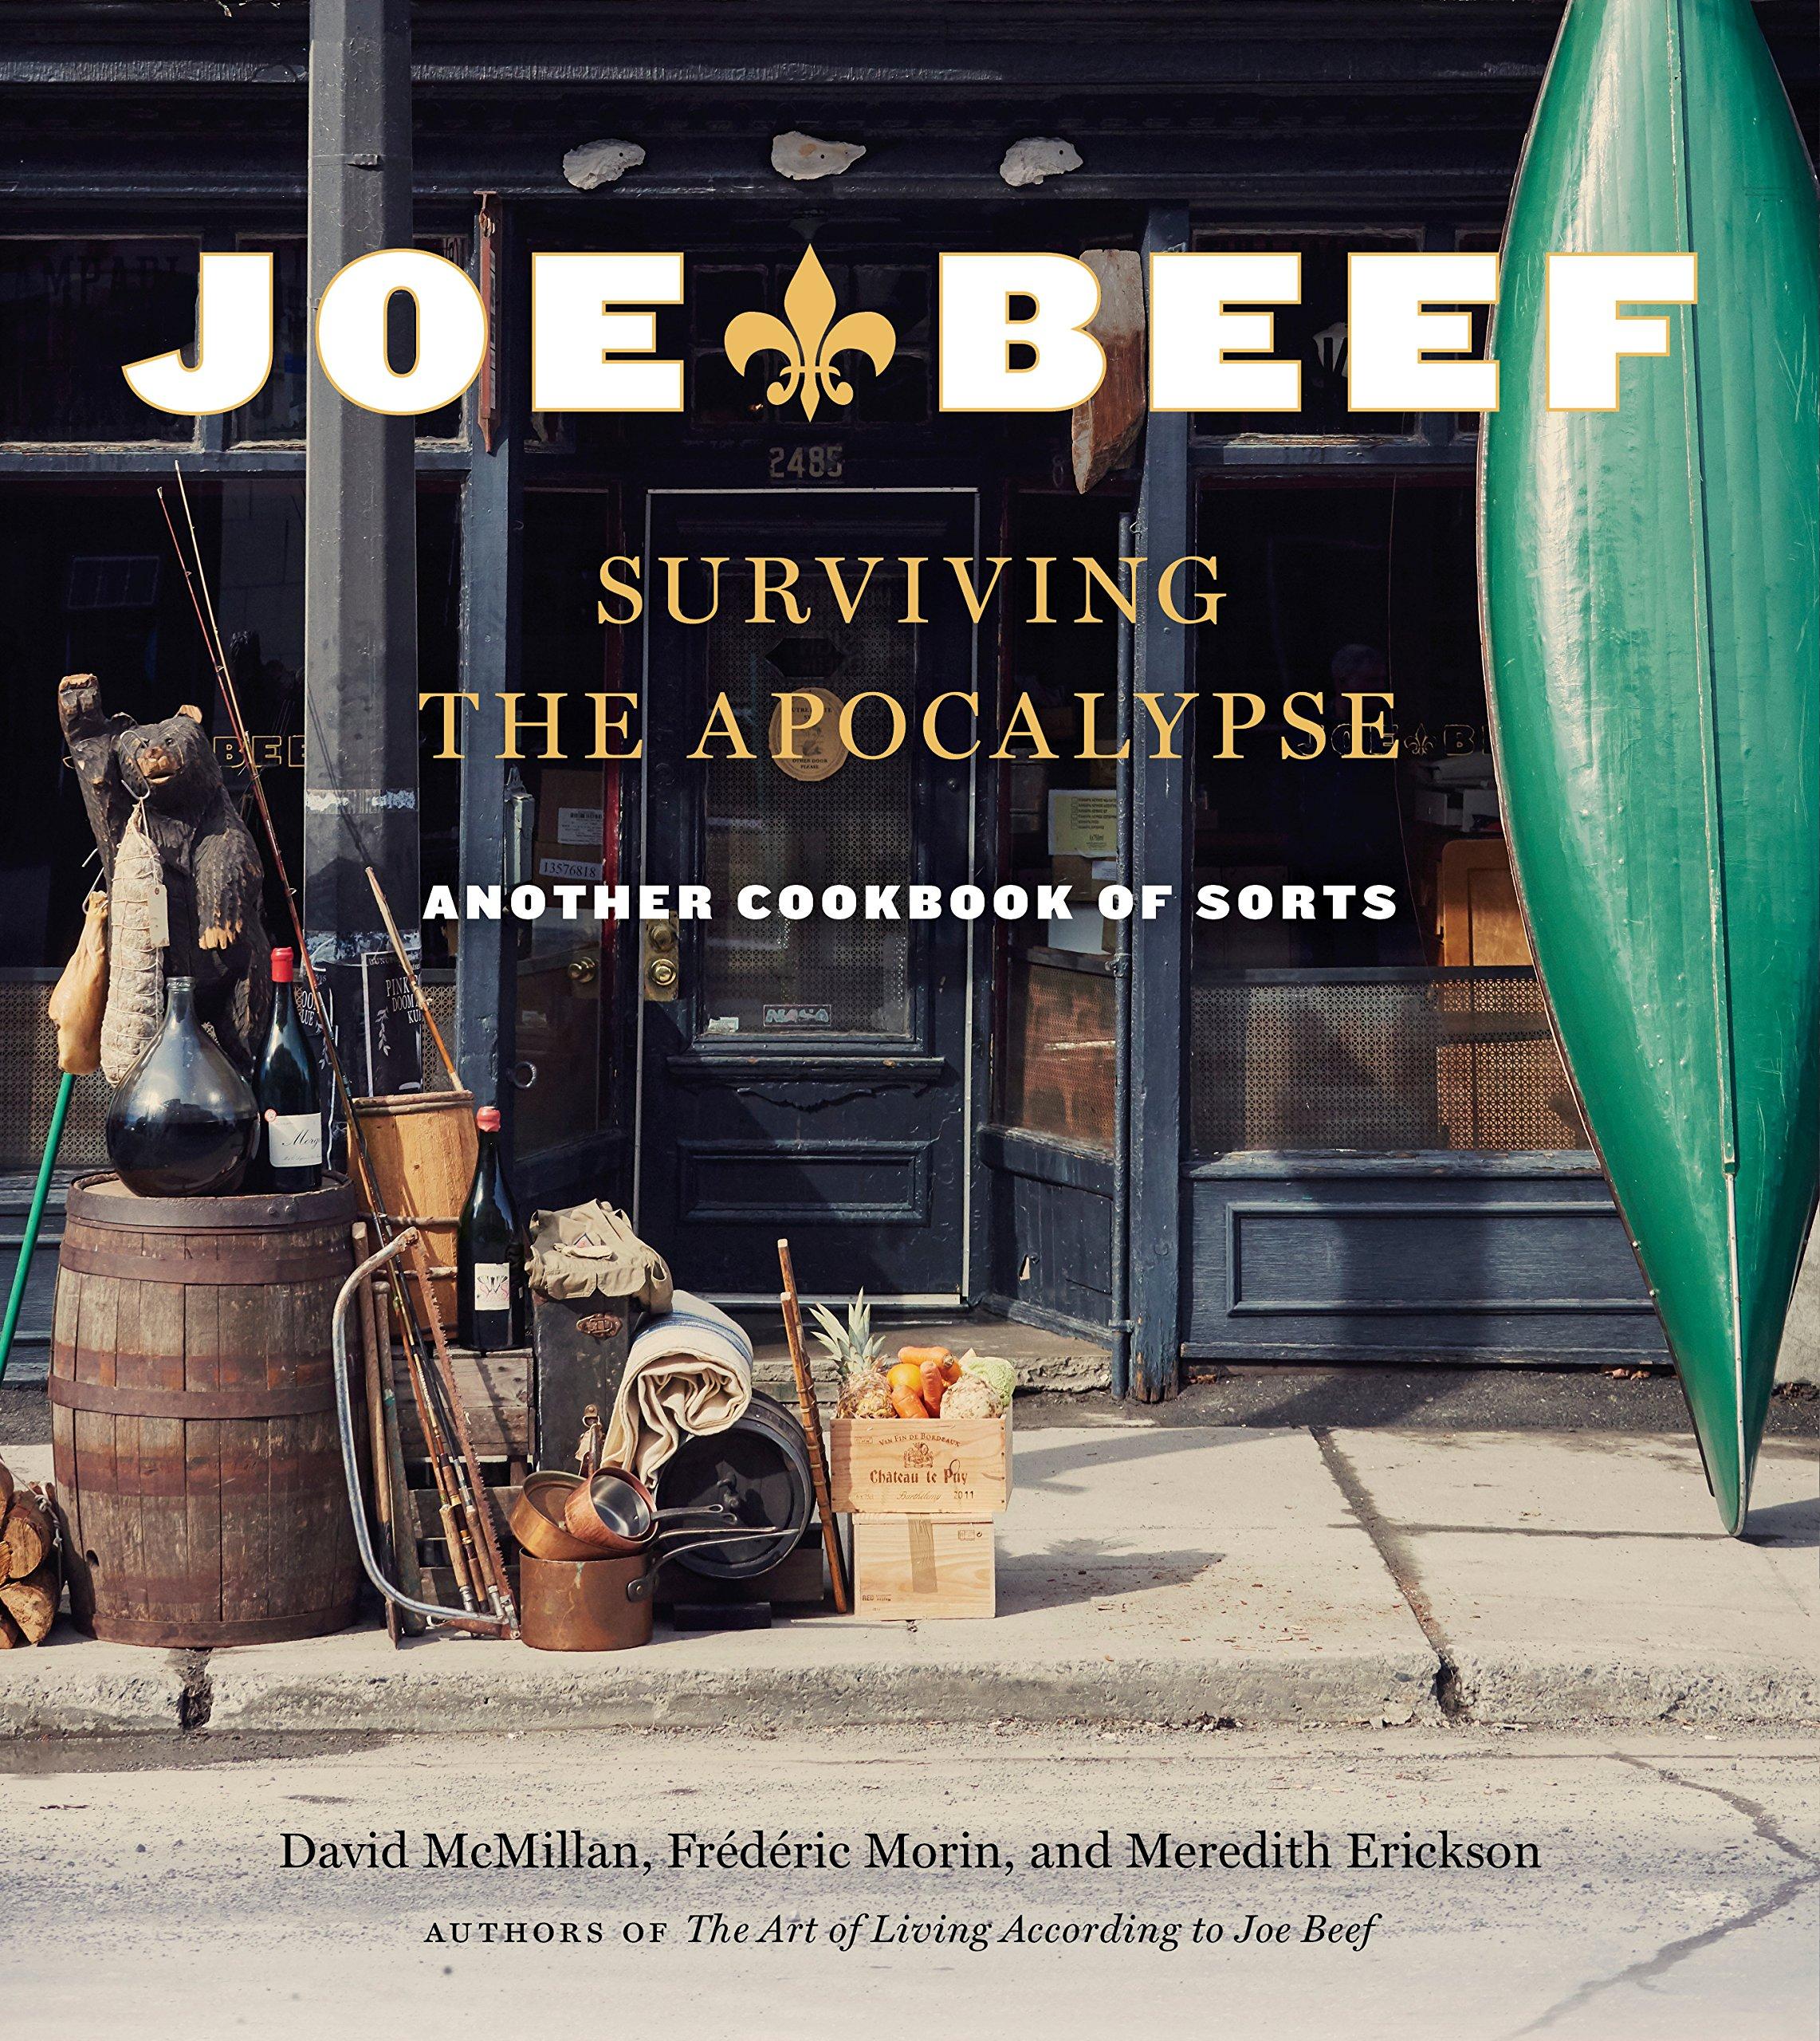 Joe Beef: Surviving the Apocalypse: Another Cookbook of Sorts: David  McMillan, Frederic Morin, Meredith Erickson: 9780147530790: Amazon.com:  Books